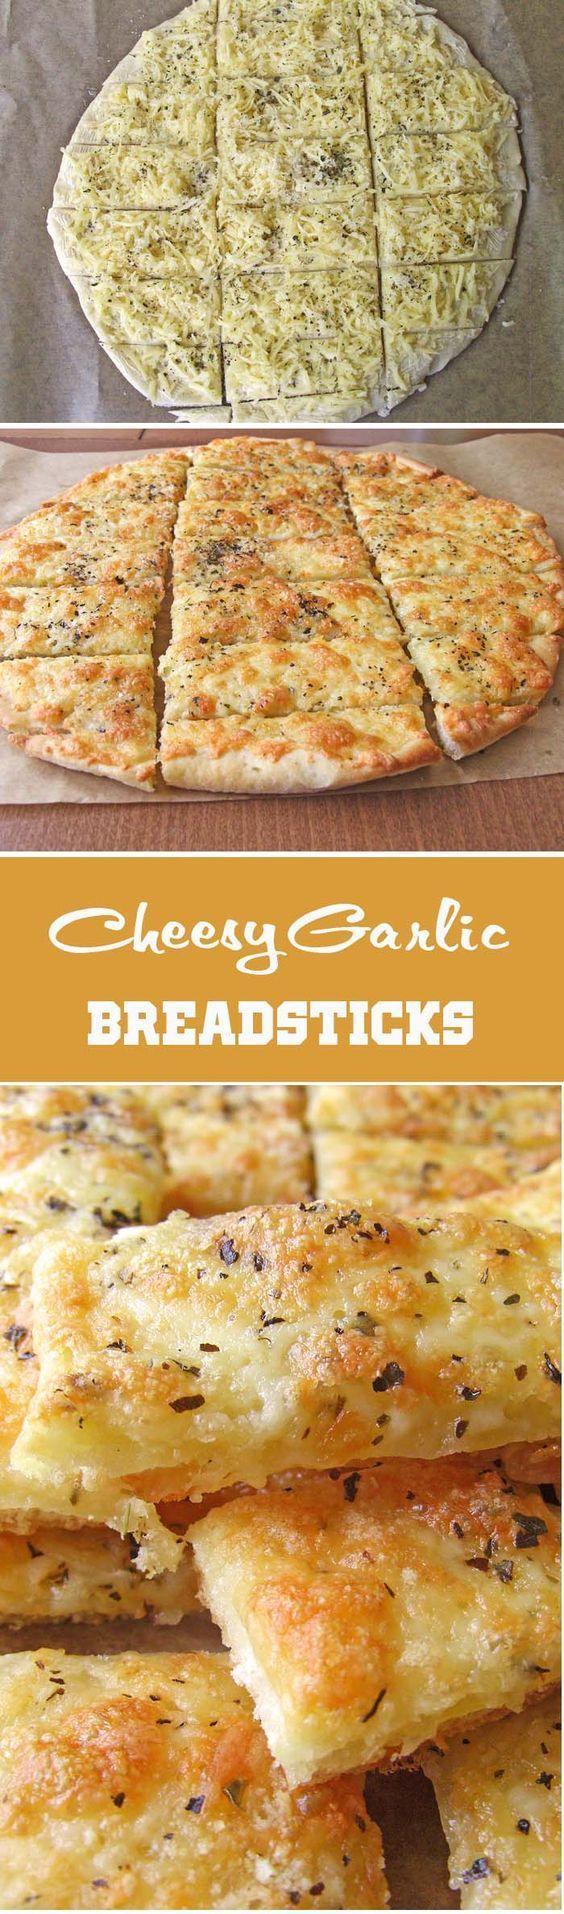 Easy Cheesy Garlic Breadsticks Recipe | Buzz Inspired